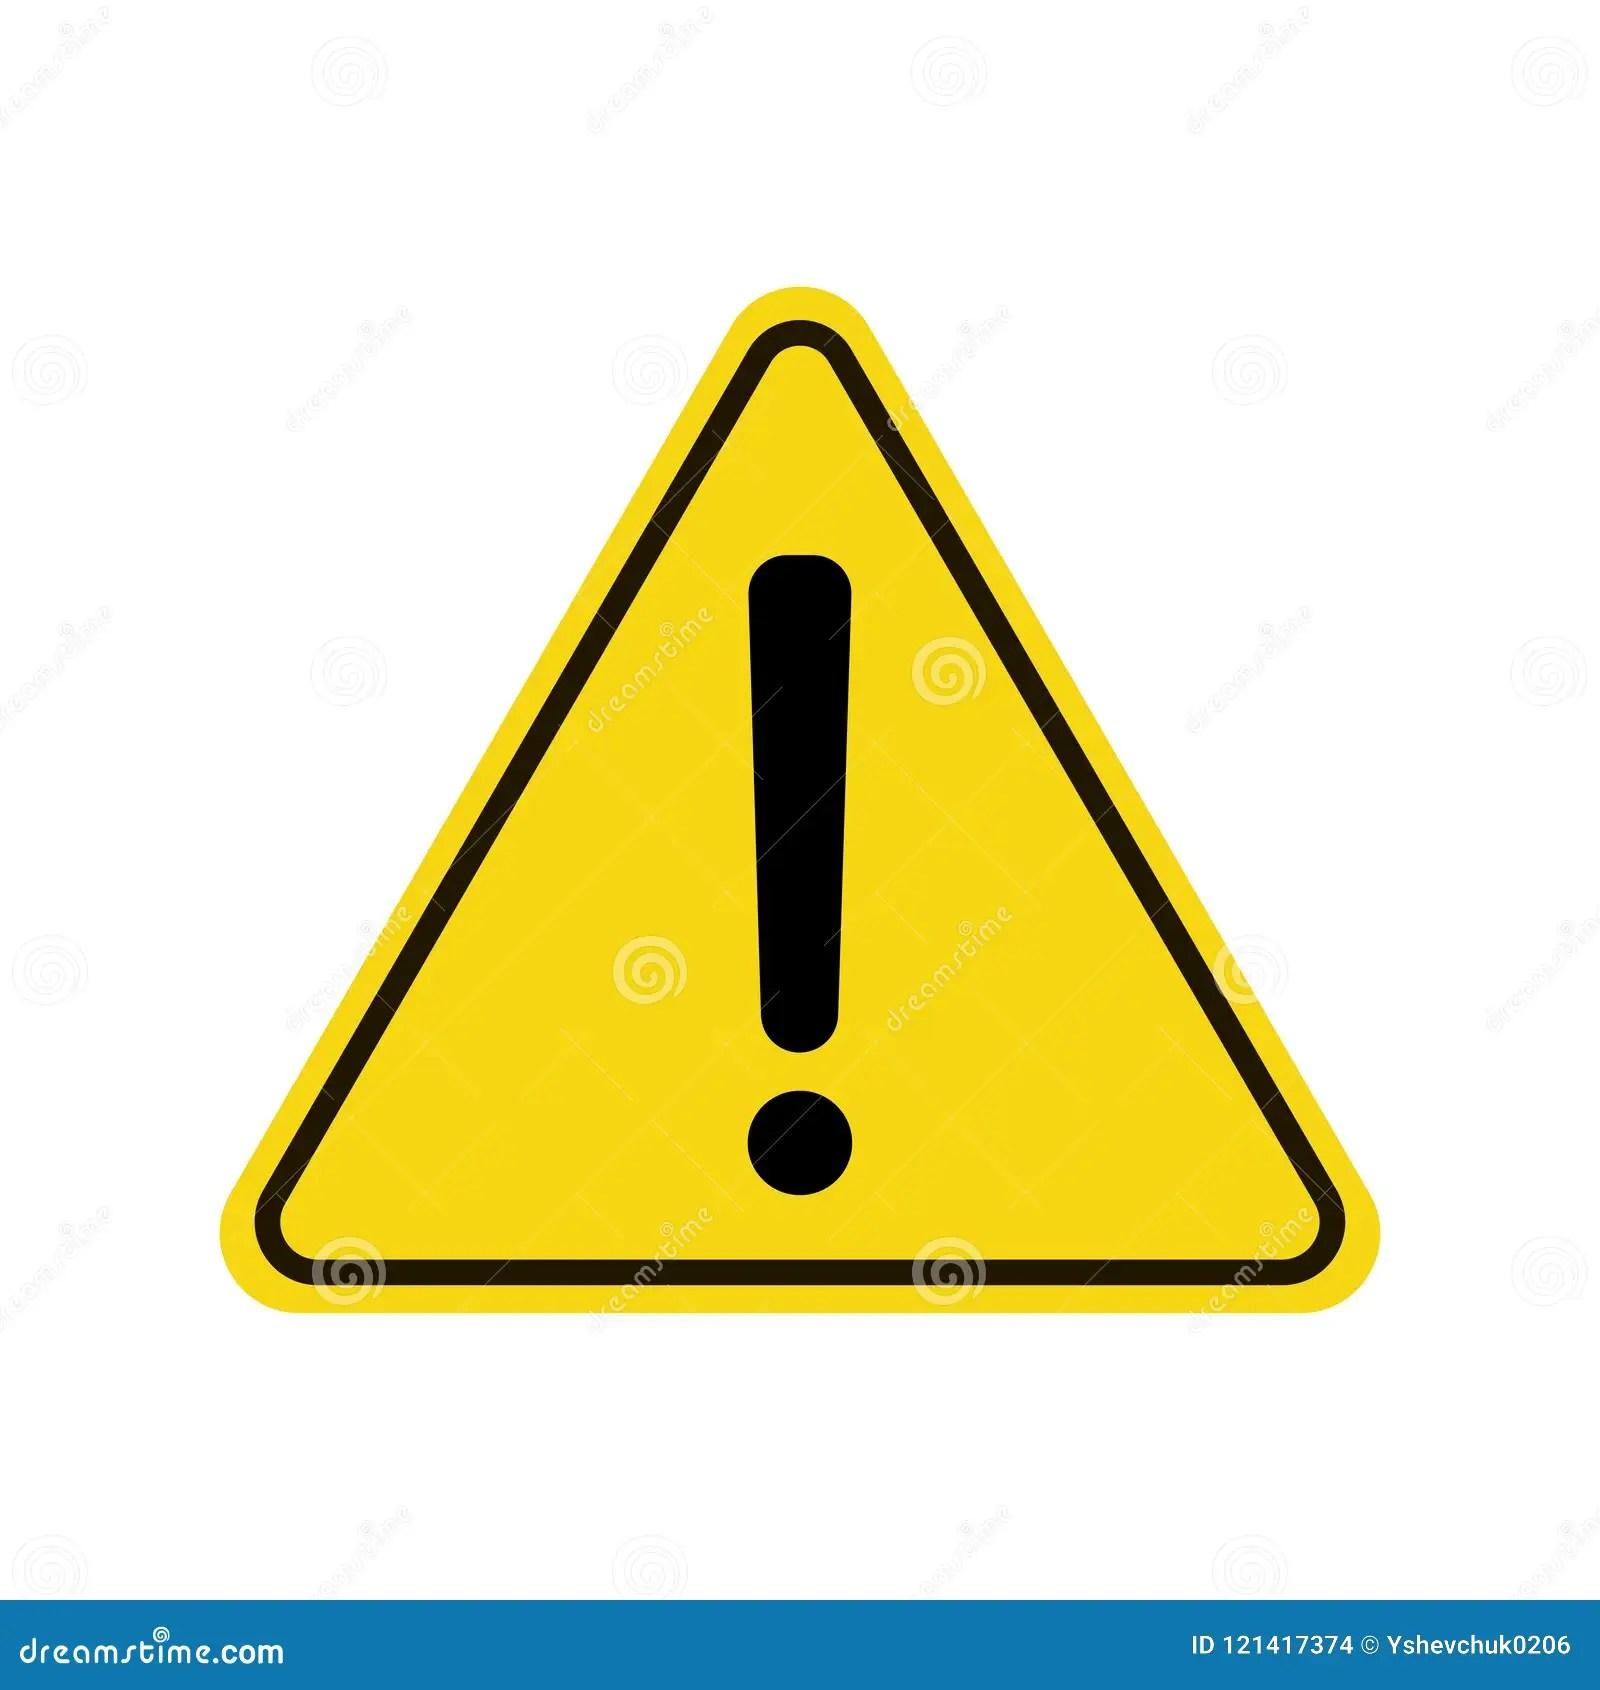 Triangle Warning Sign Exclamation Sign Warning Roadsign